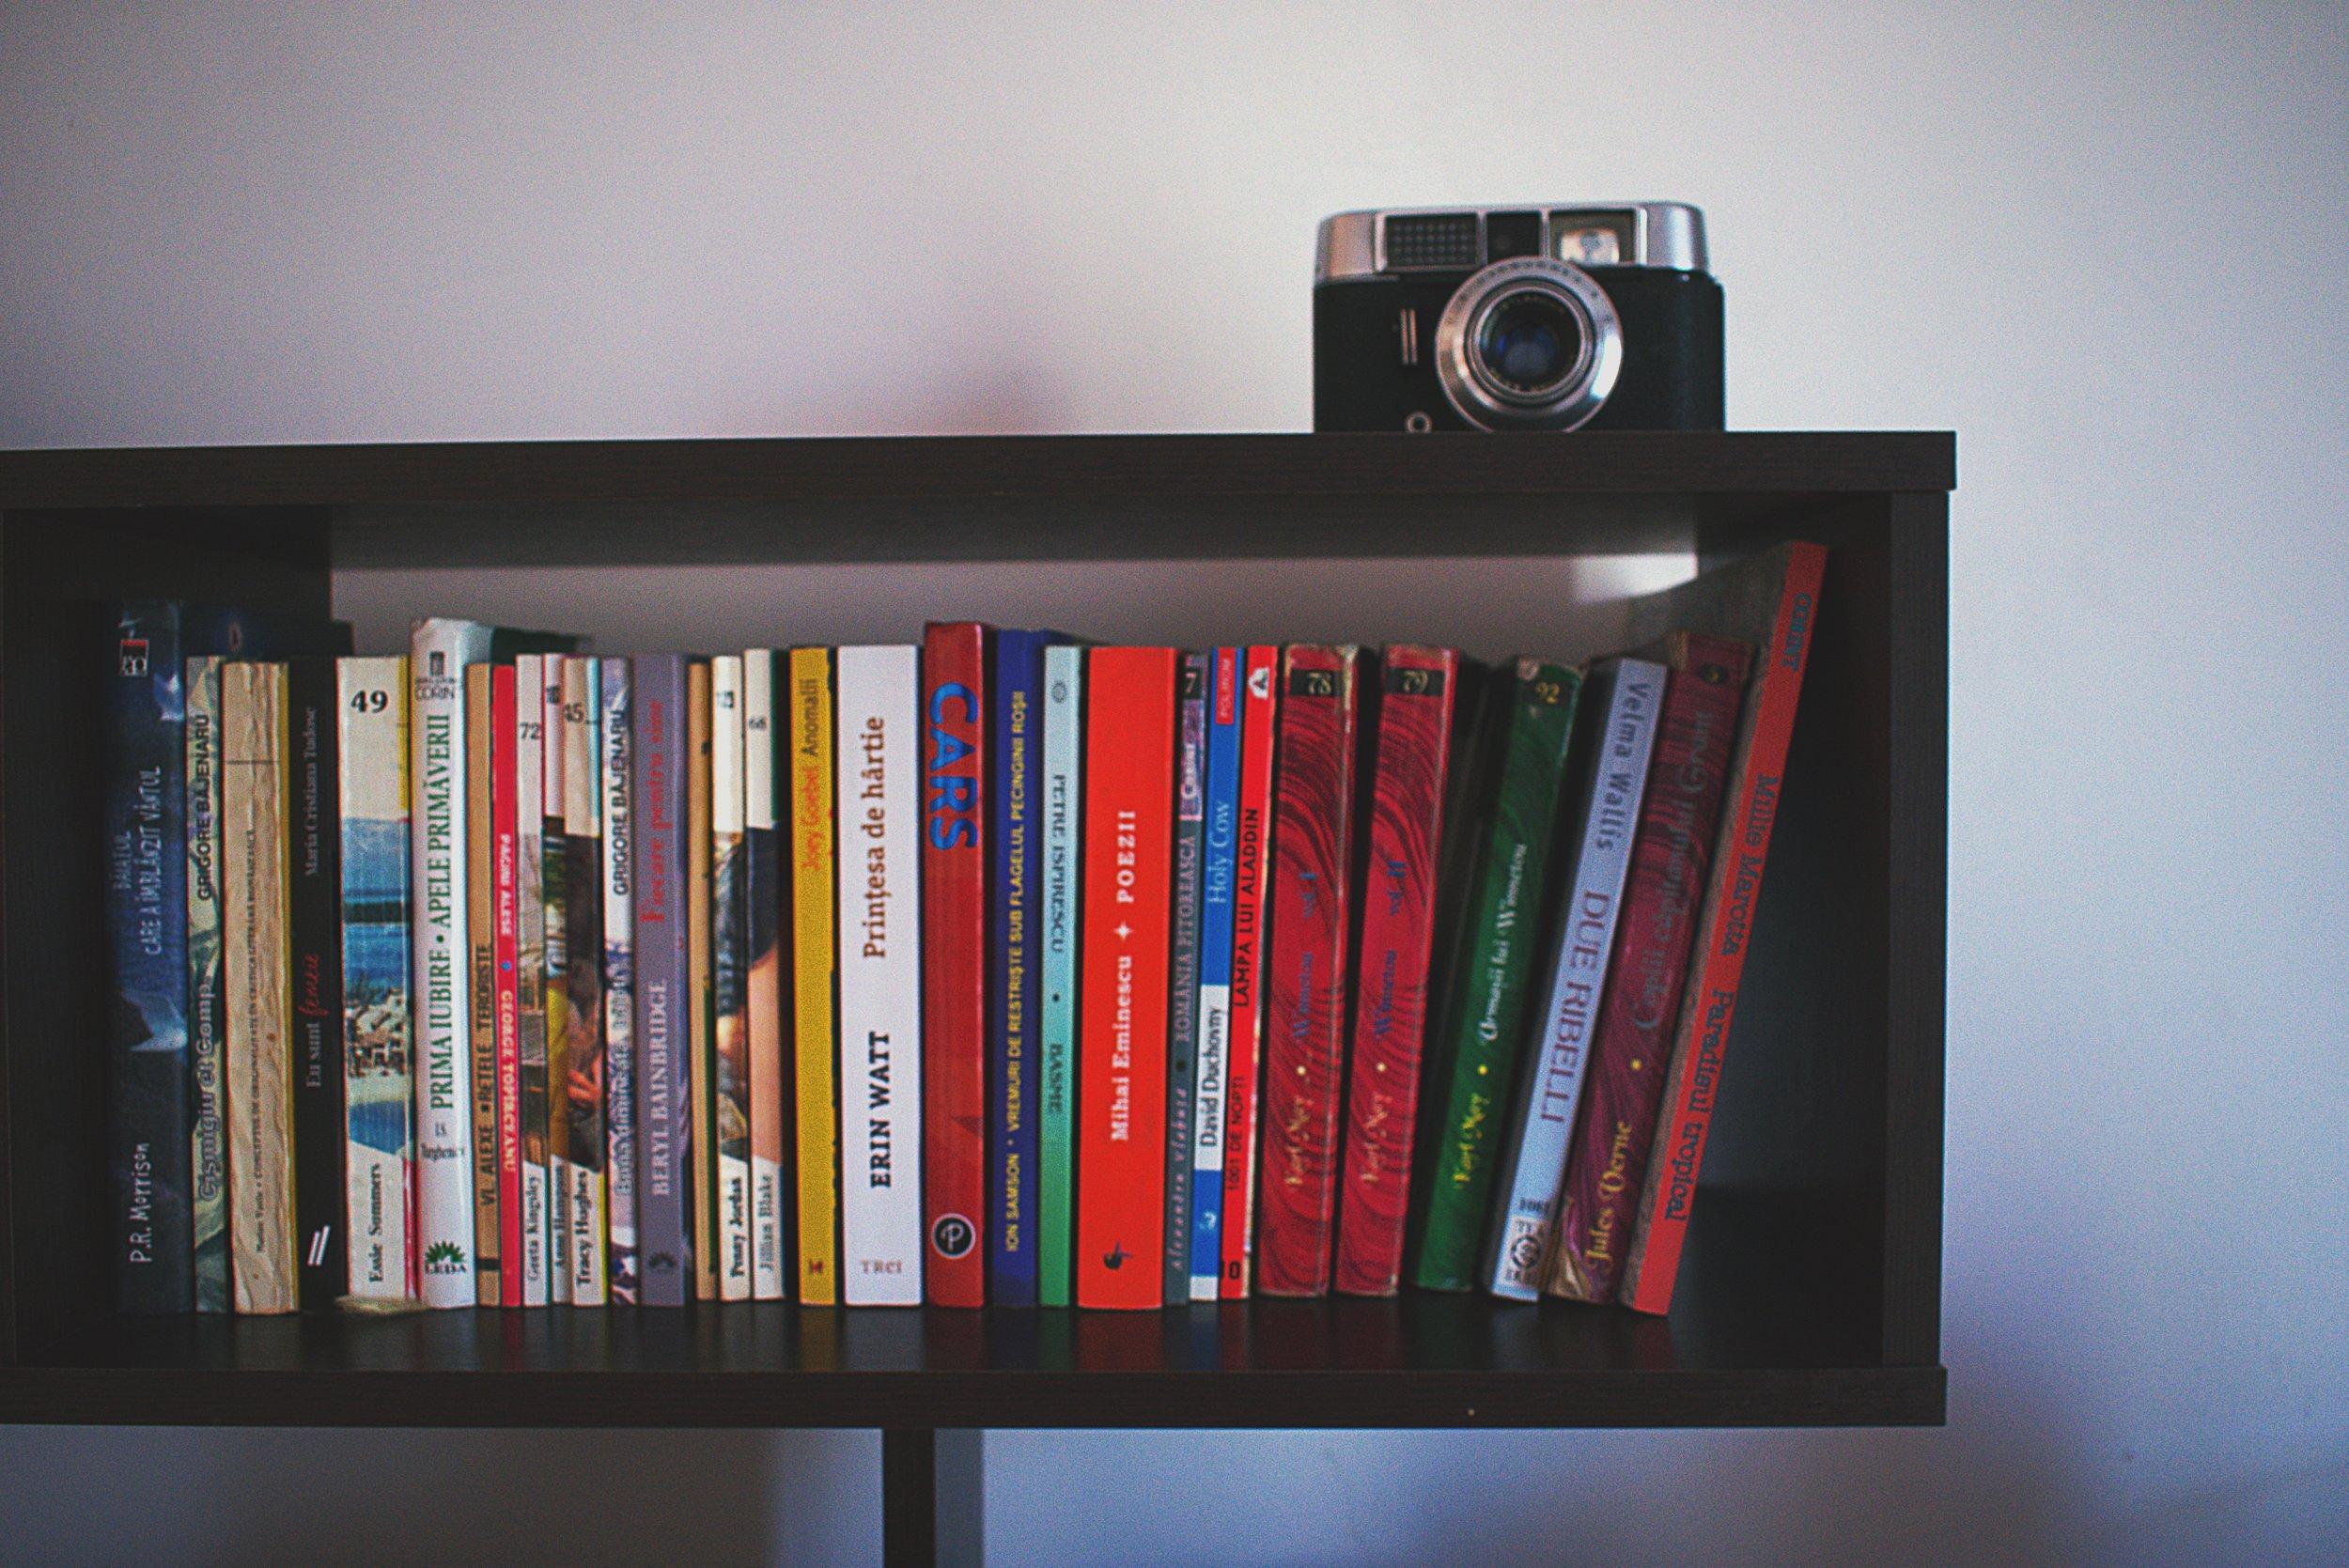 book-stack-bookcase-books-1420212.jpg